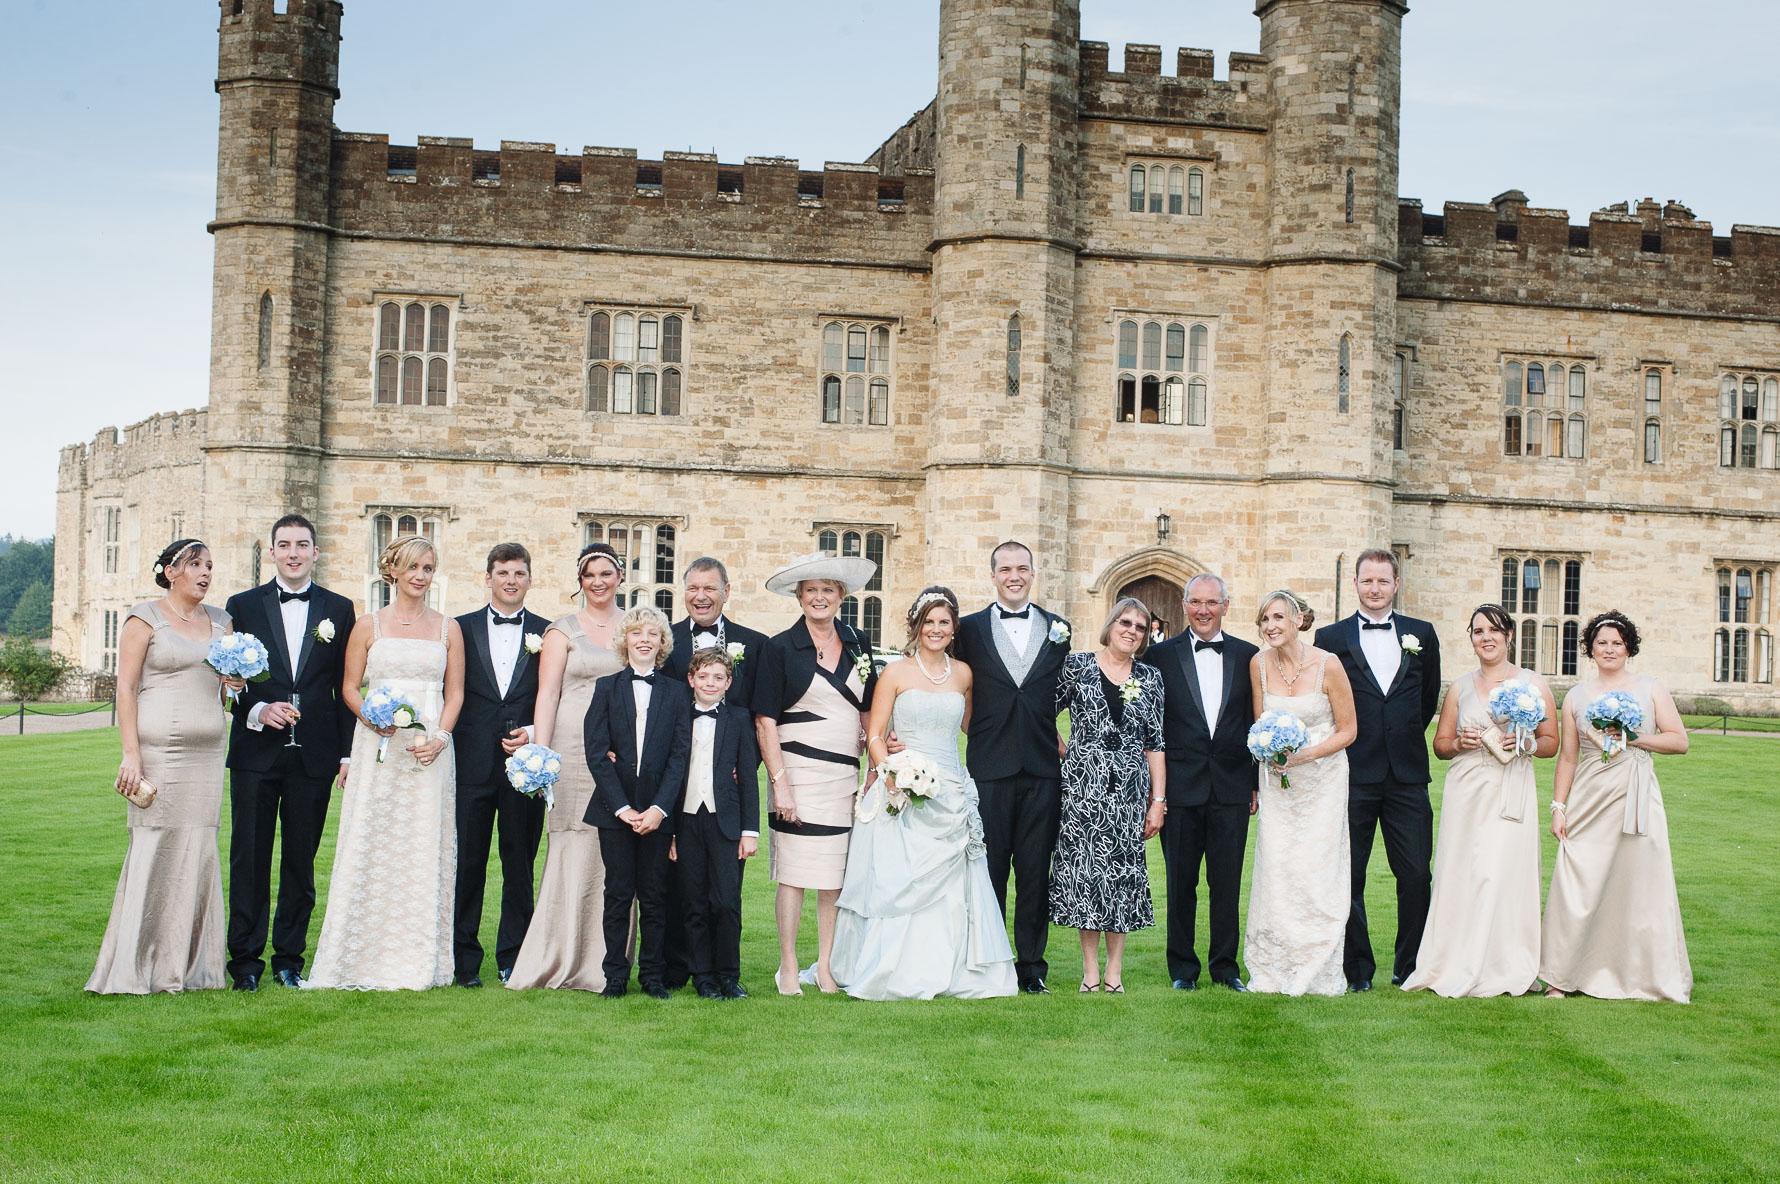 Leeds Castle Wedding30-20140919 0850